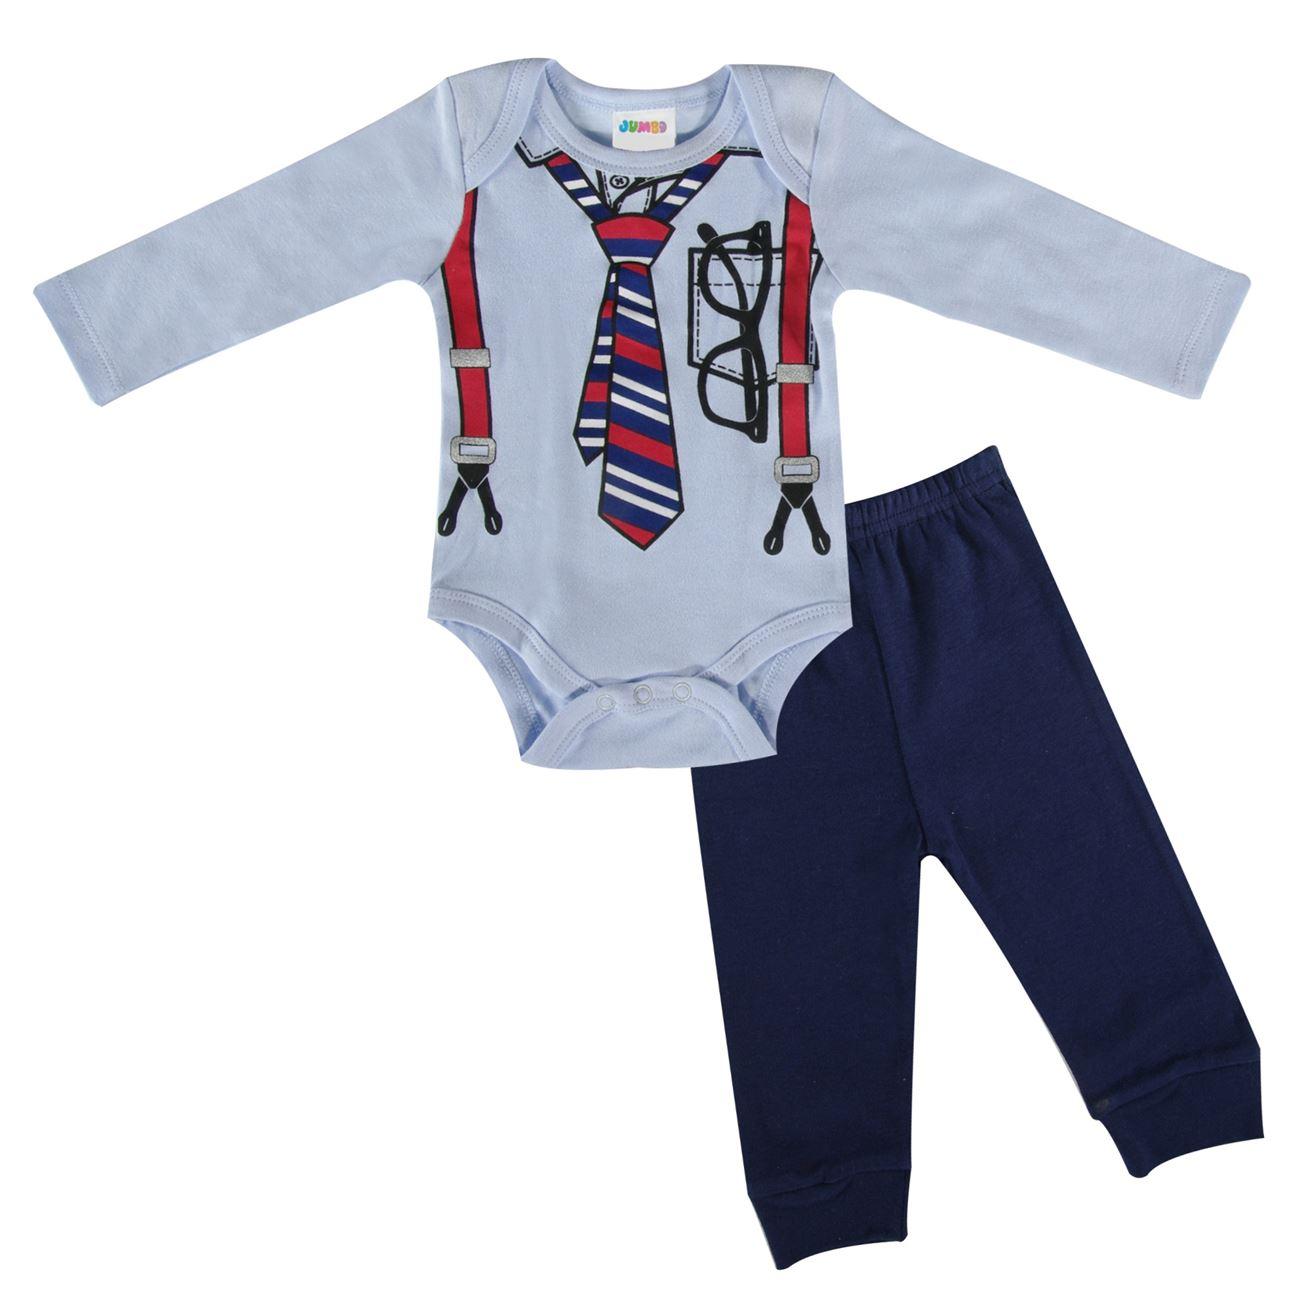 4c5de012022 Σετ Φορμάκι Παντελόνι Βρεφικό < Σετ Βαμβακερό για Αγόρια | Jumbo